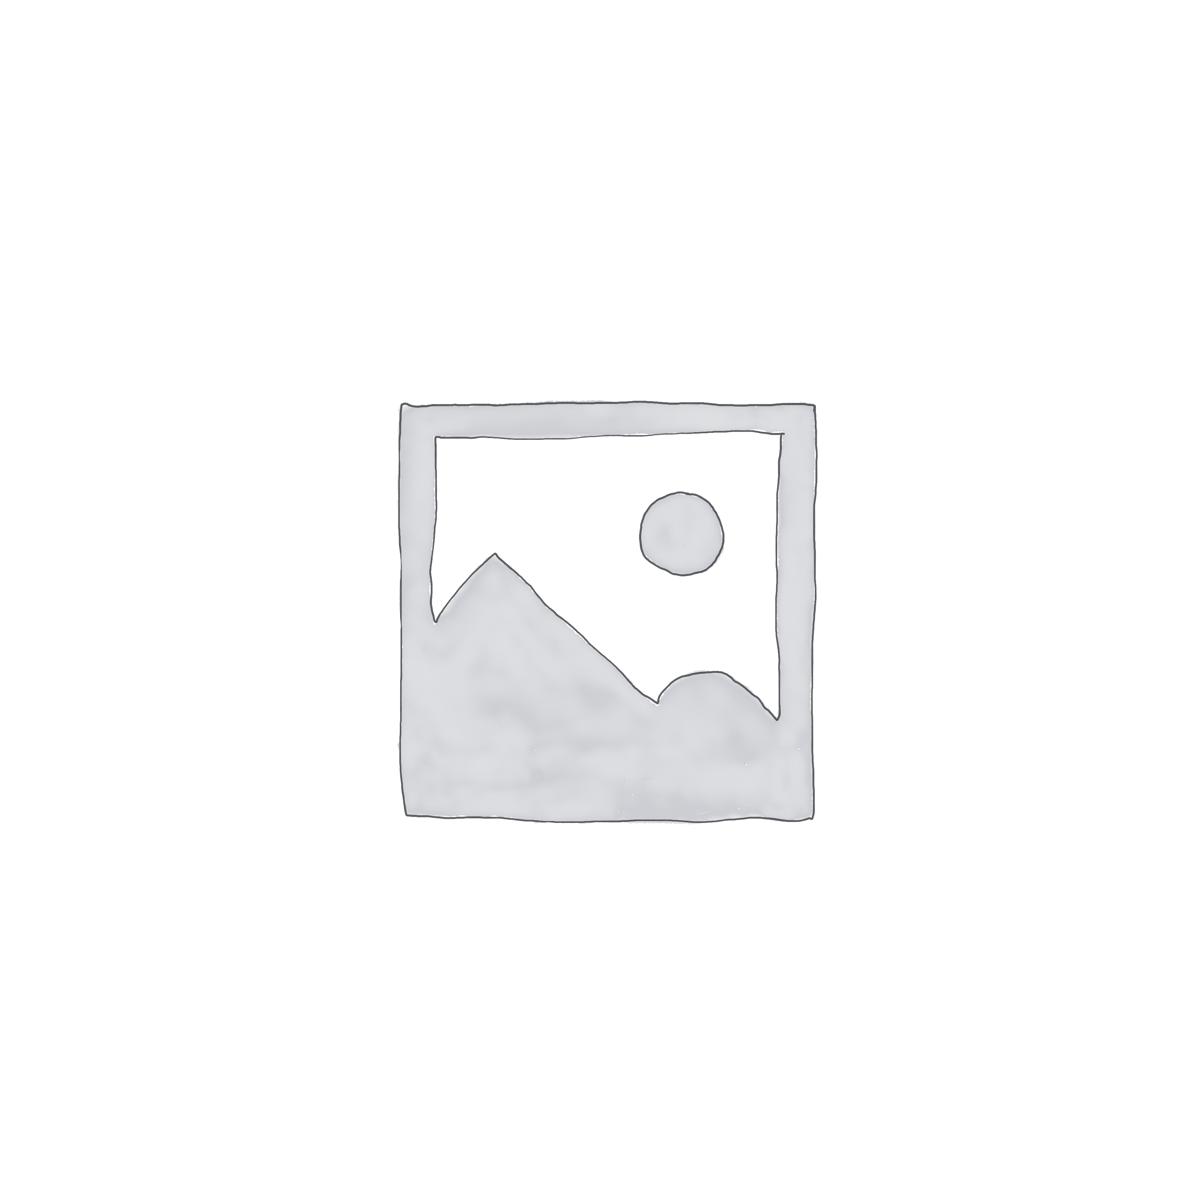 Soft Banana Leaf Pattern Wallpaper Mural